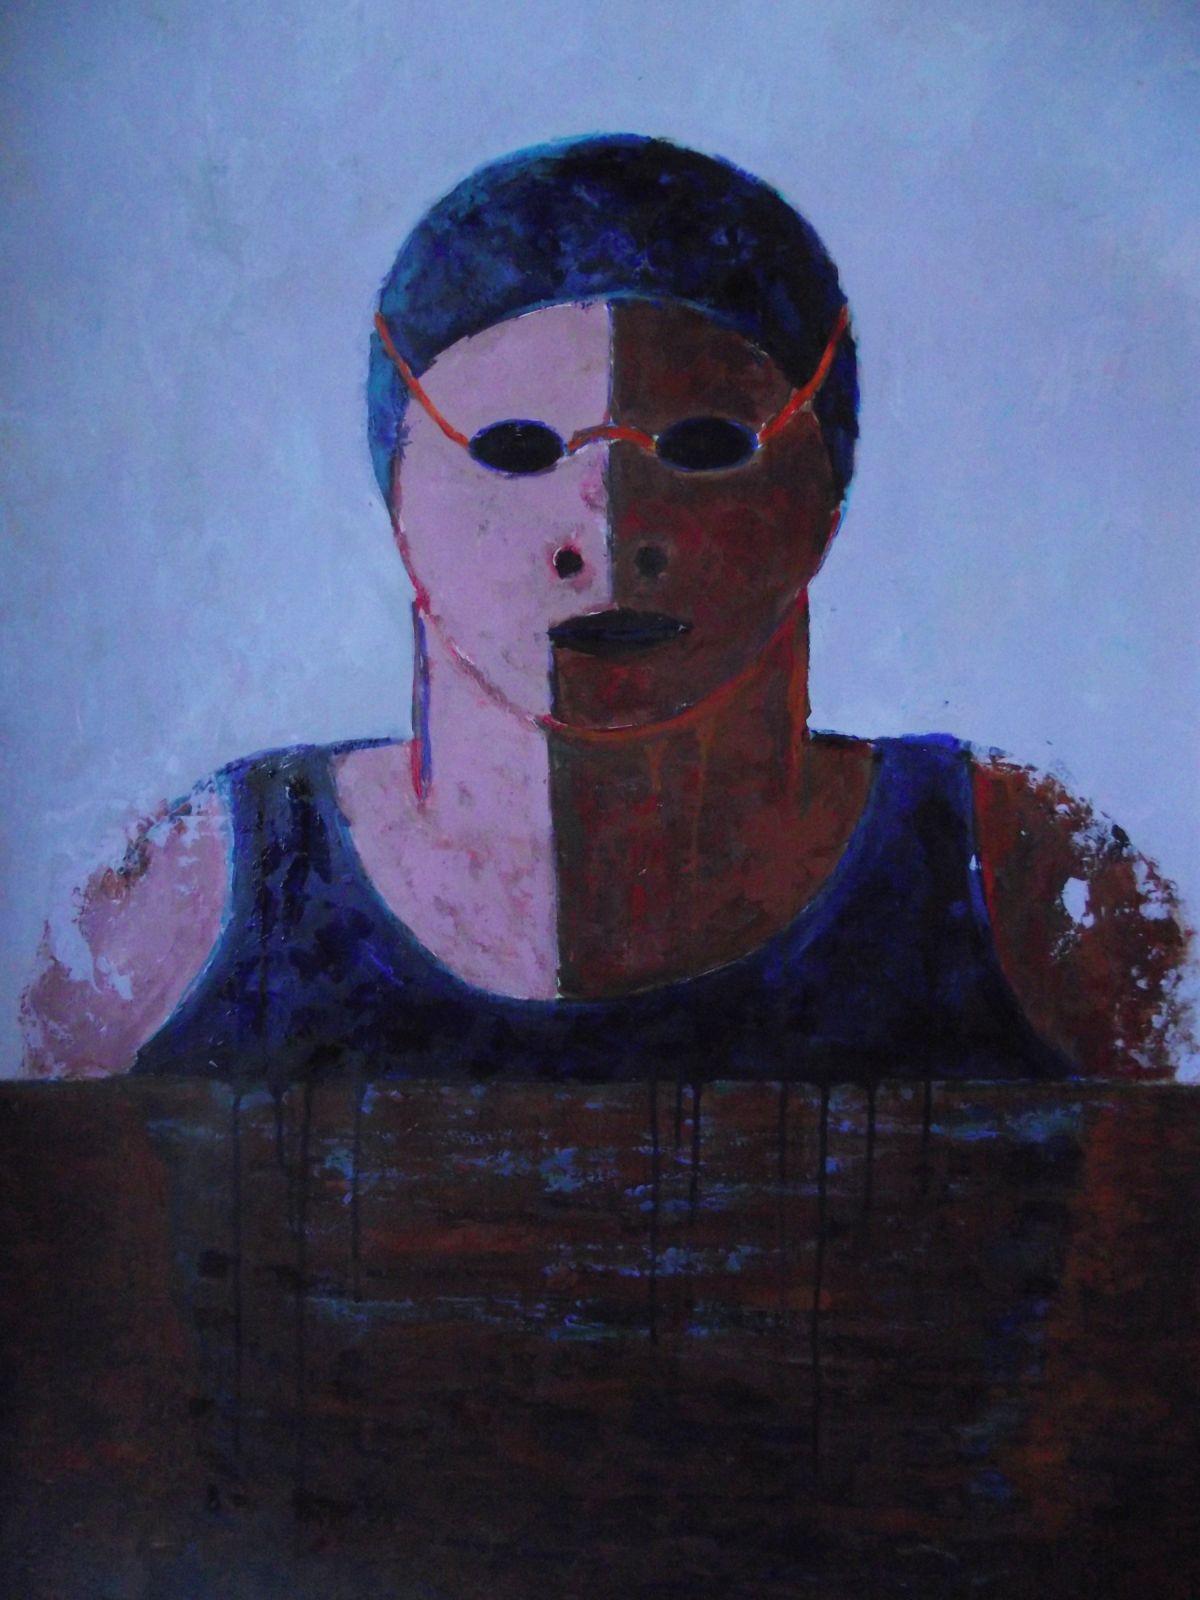 NADADOR NEGRO (2012) - Francisco Serrano Gutierrez - F.Serrano